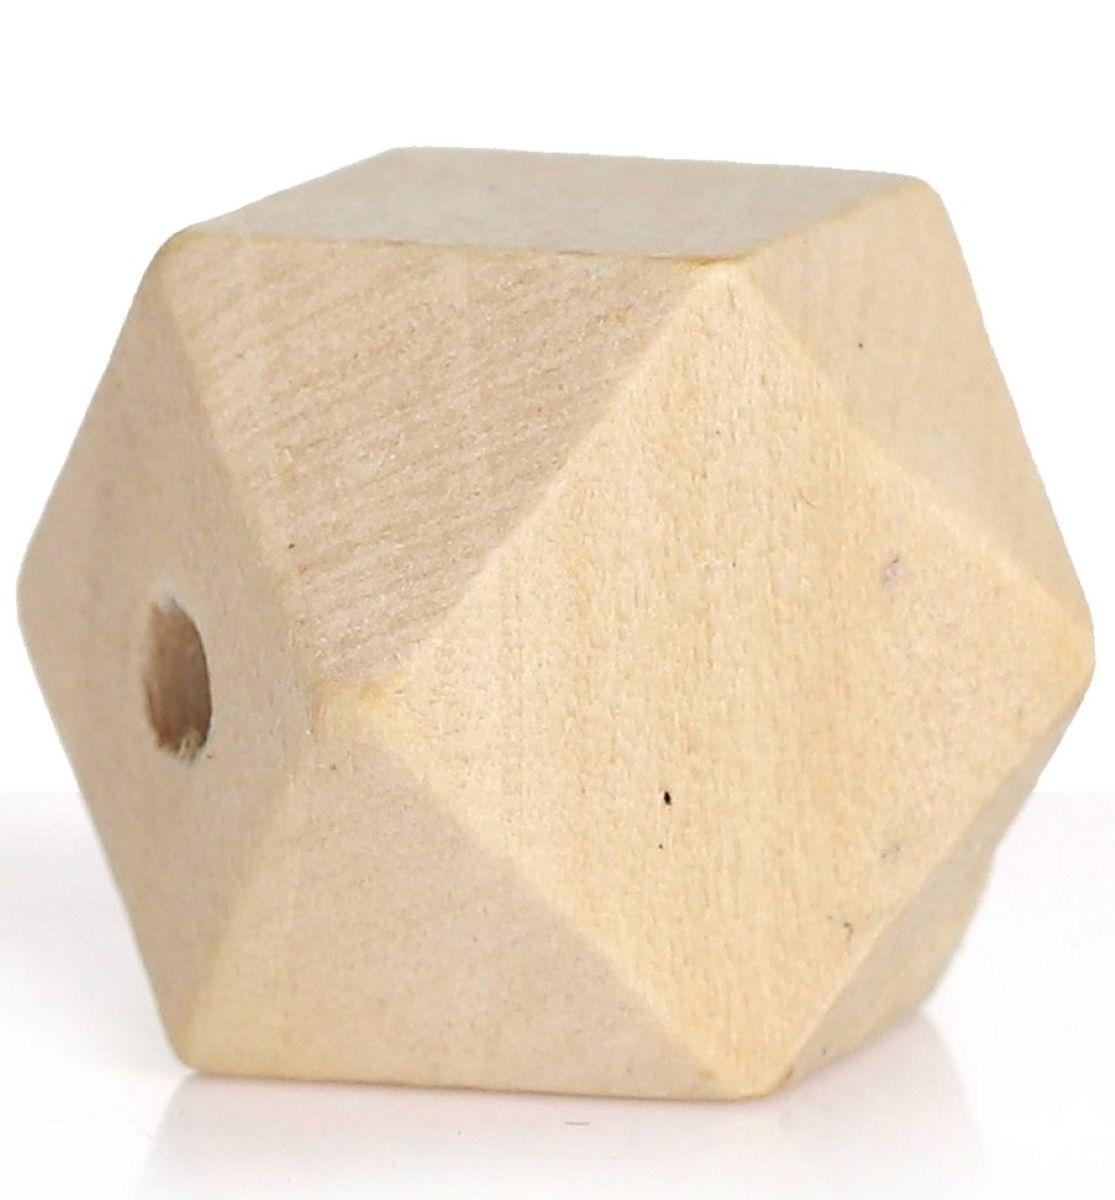 Eckige Holzperlen, Polygone - 20 Stück - 16 x 16 mm